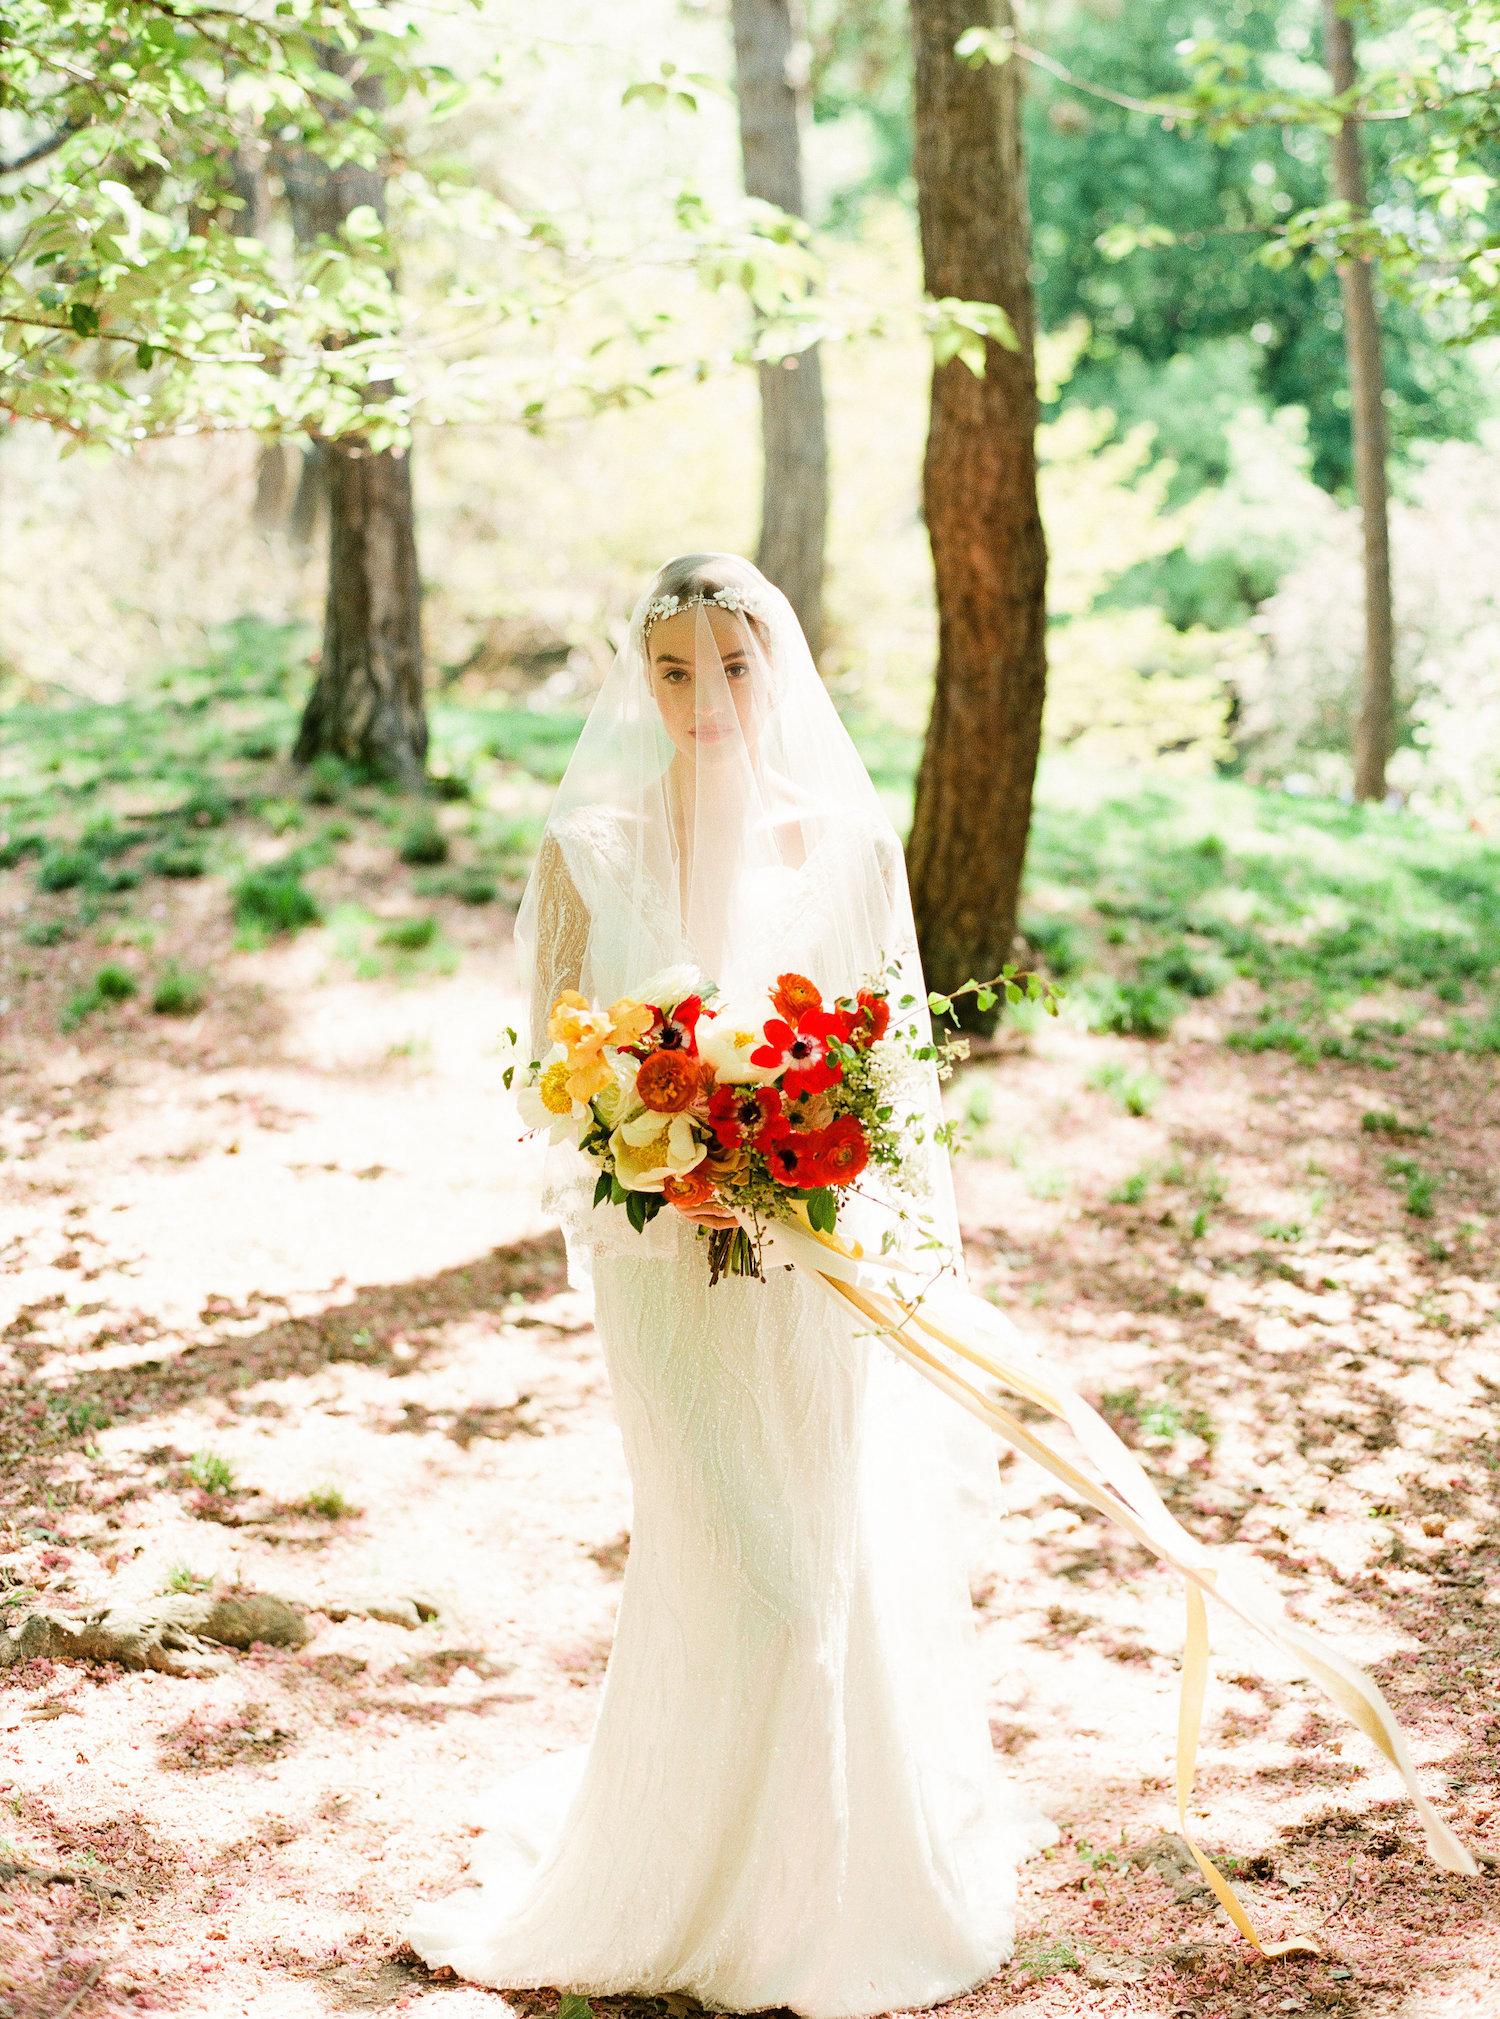 Morning Glow - Full Aperture Floral & Lindsay Madden Photography 17.jpeg